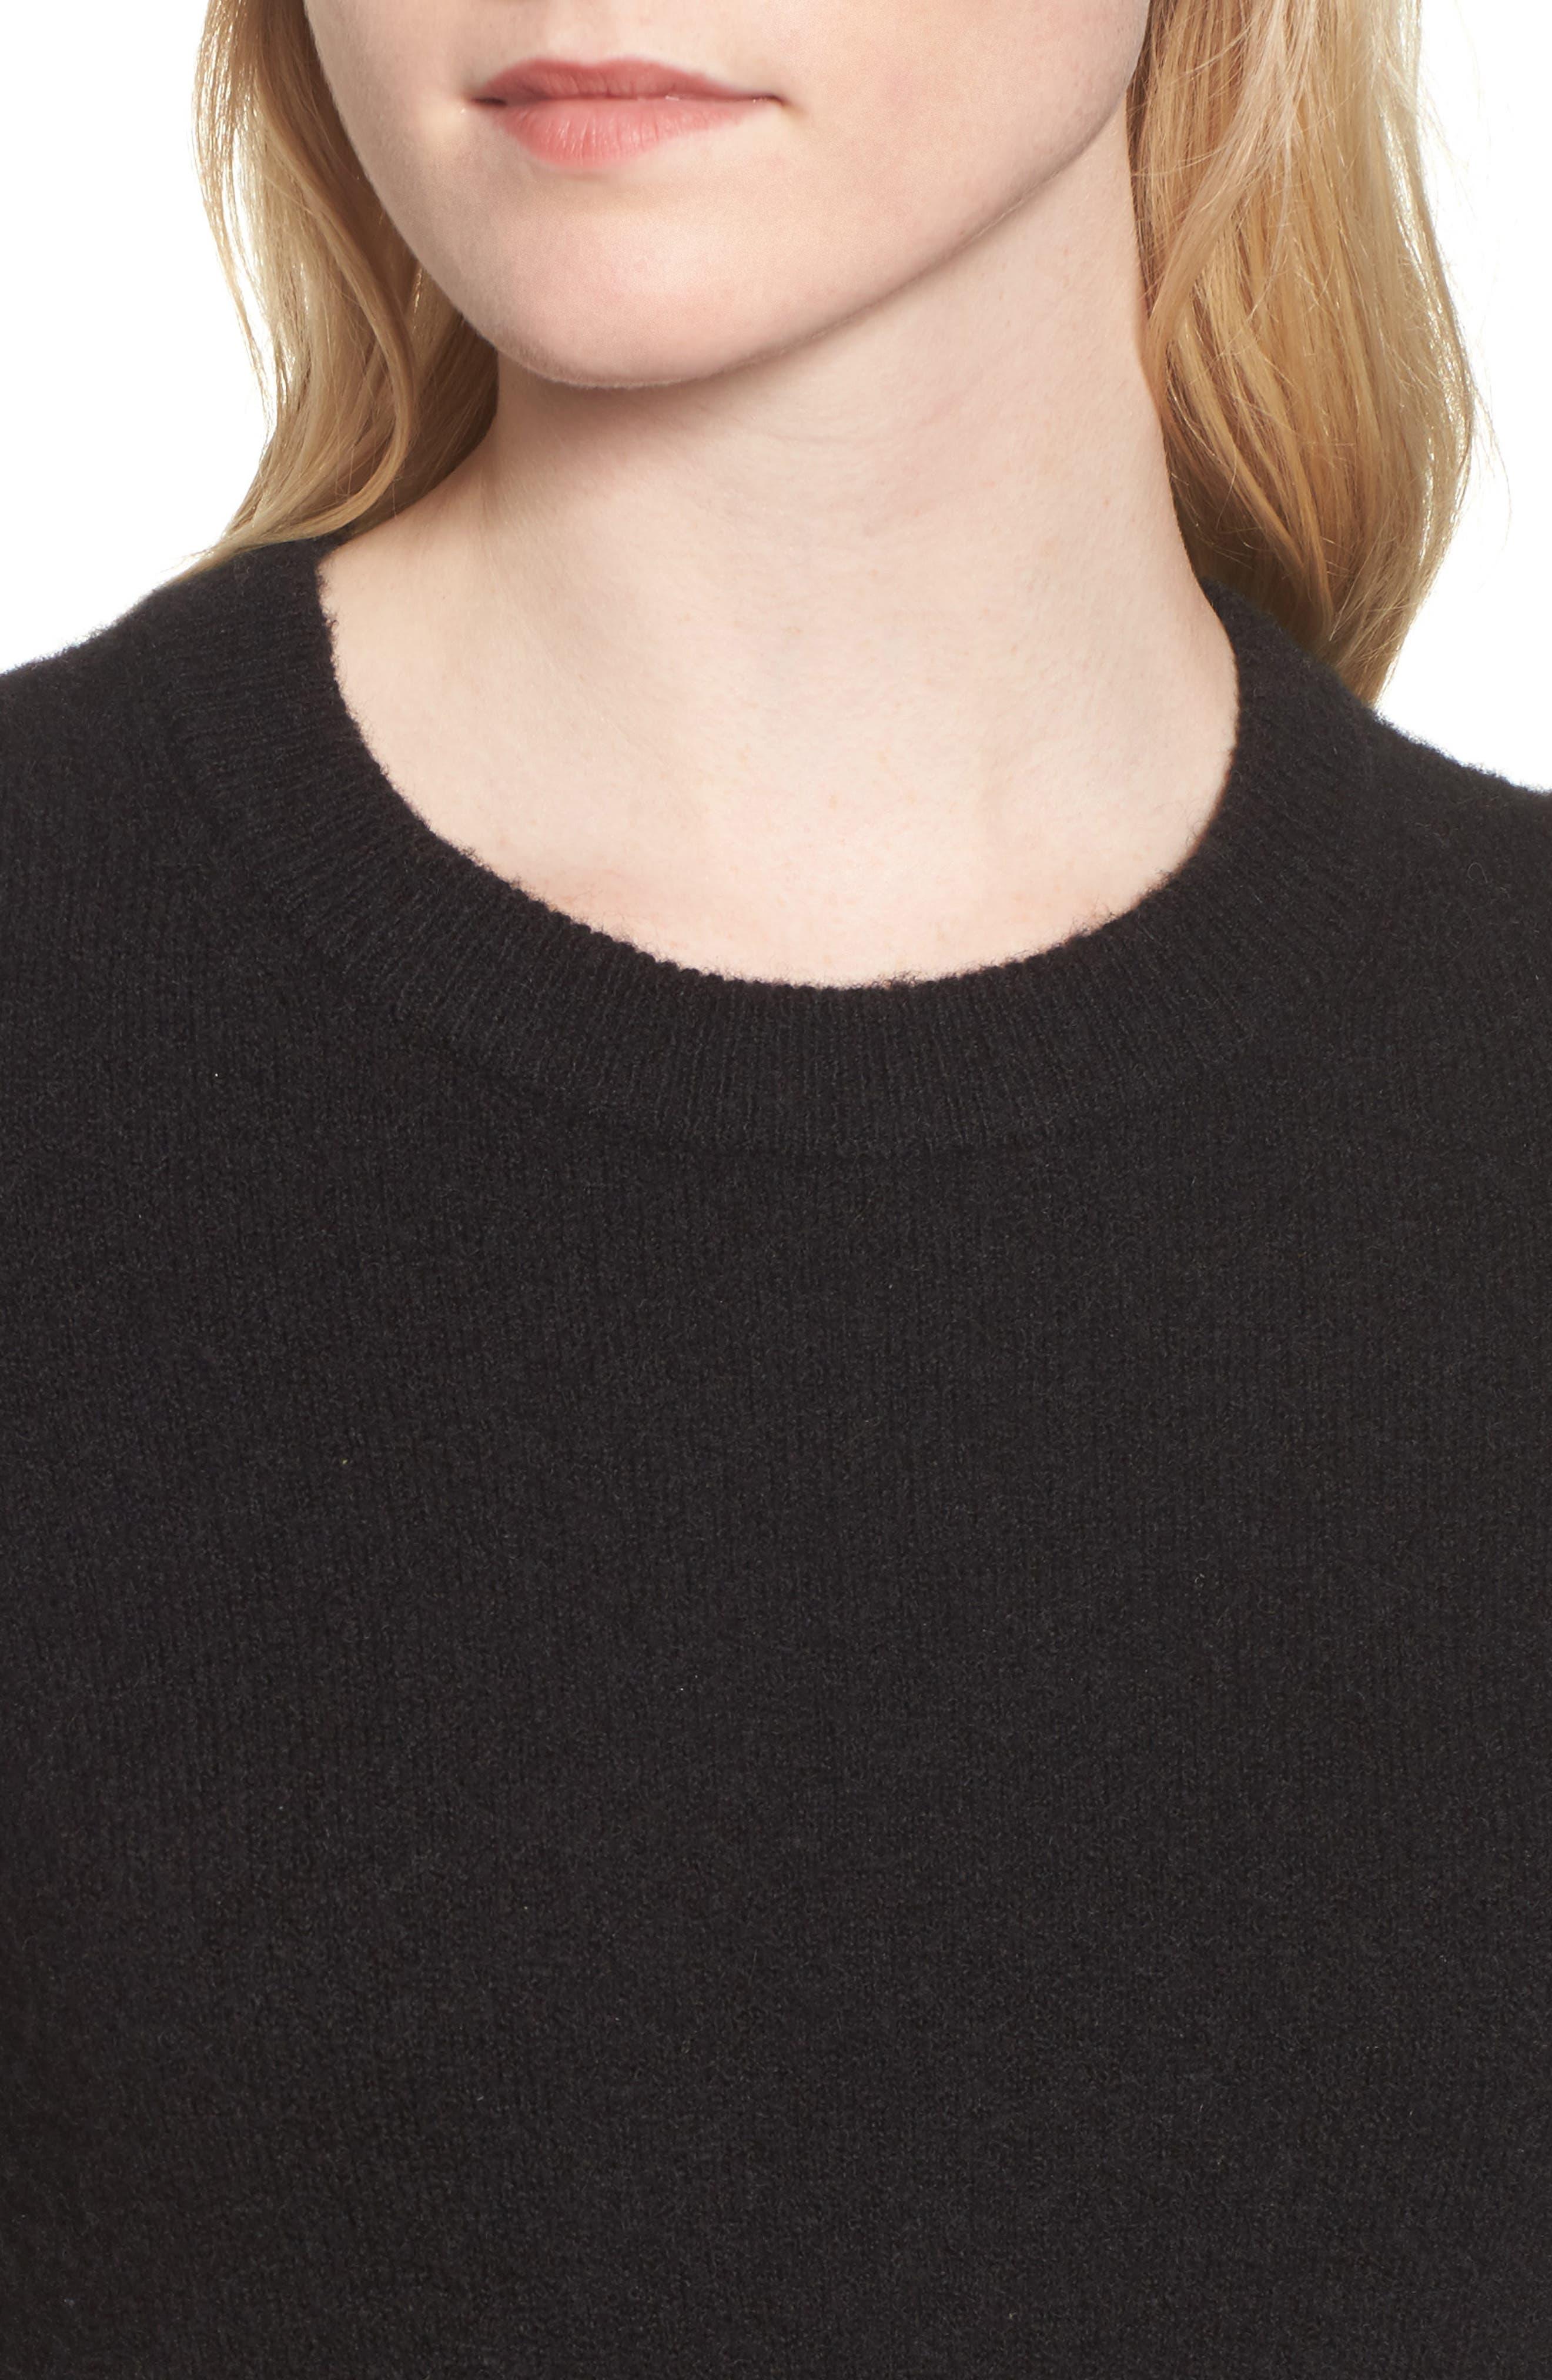 Fremont Colorblock Pullover Sweater,                             Alternate thumbnail 5, color,                             True Black